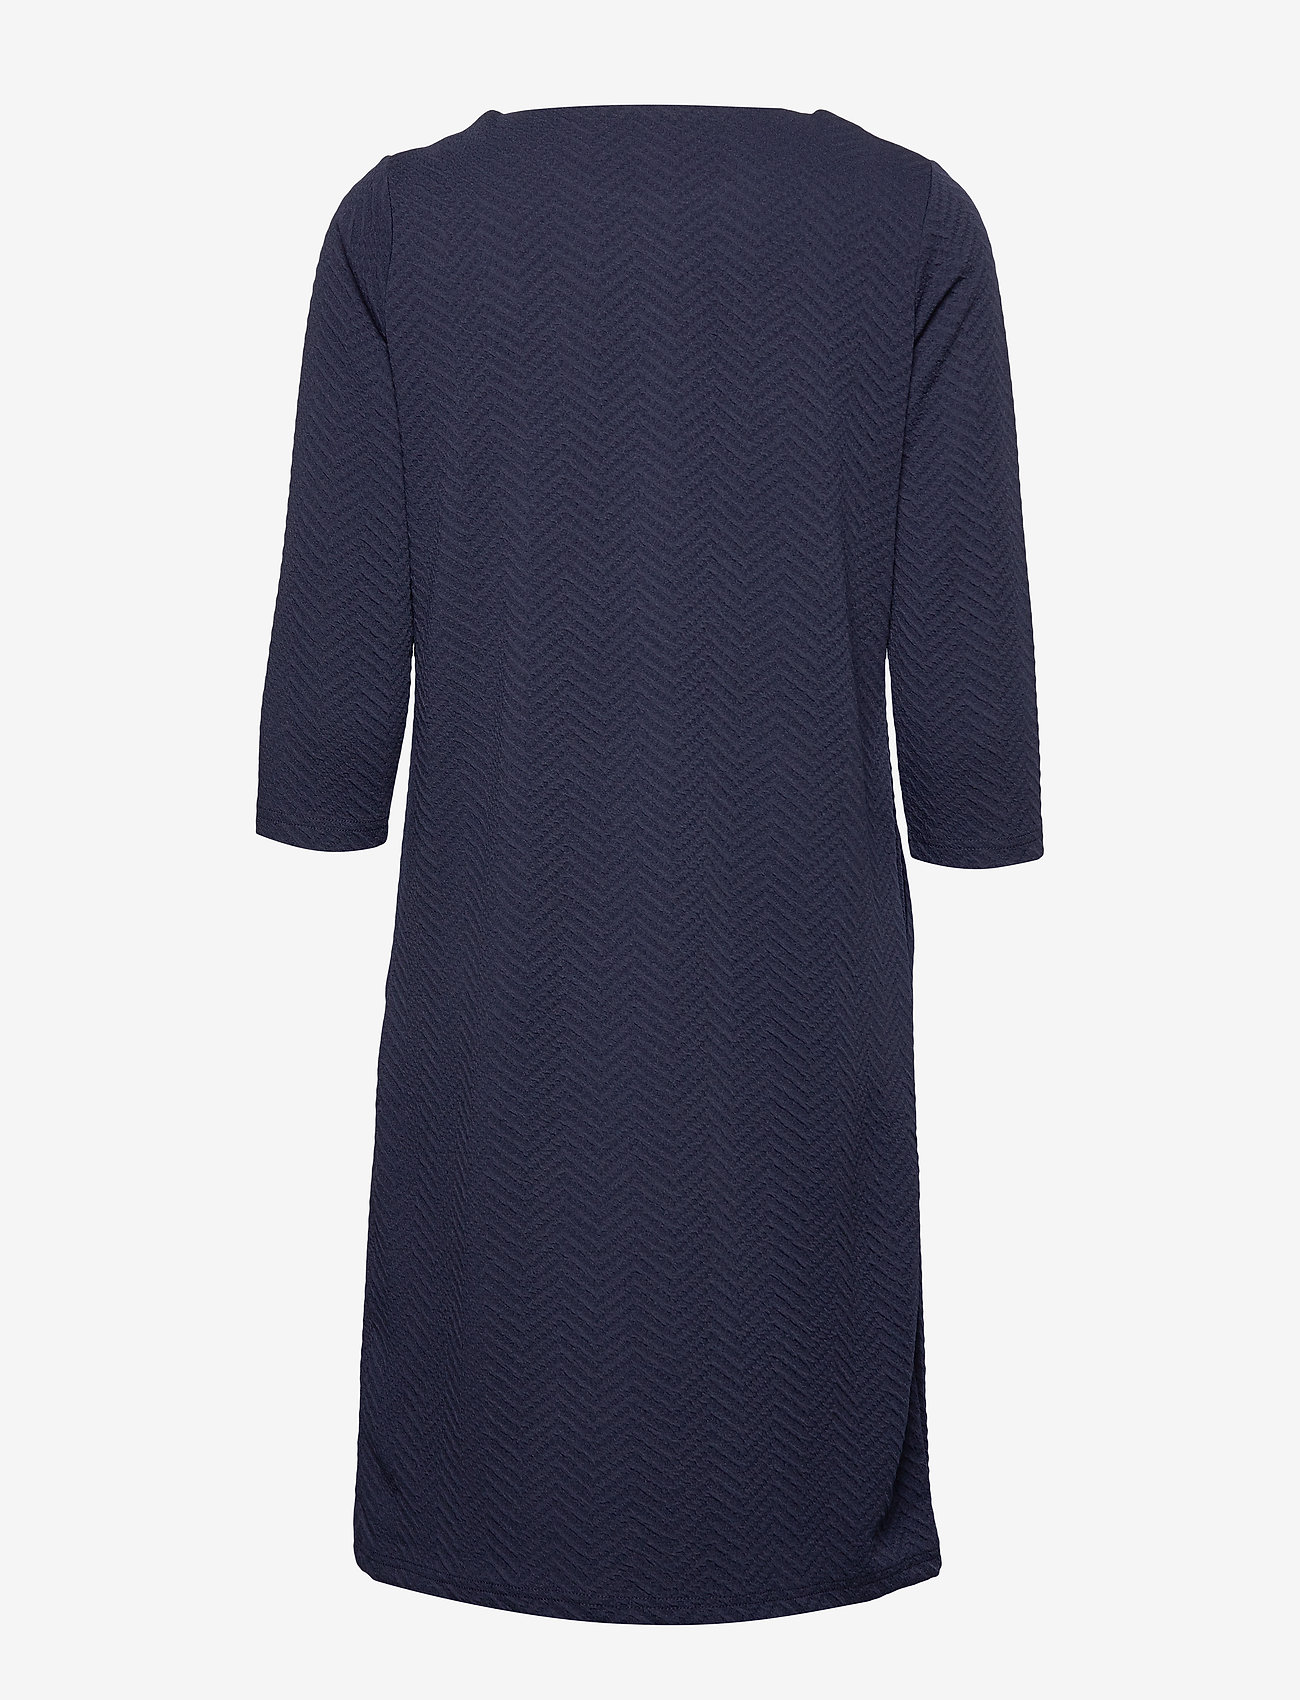 Soyaconcept - SC-SIHAM JACQUARD - robes longeur du midi - navy